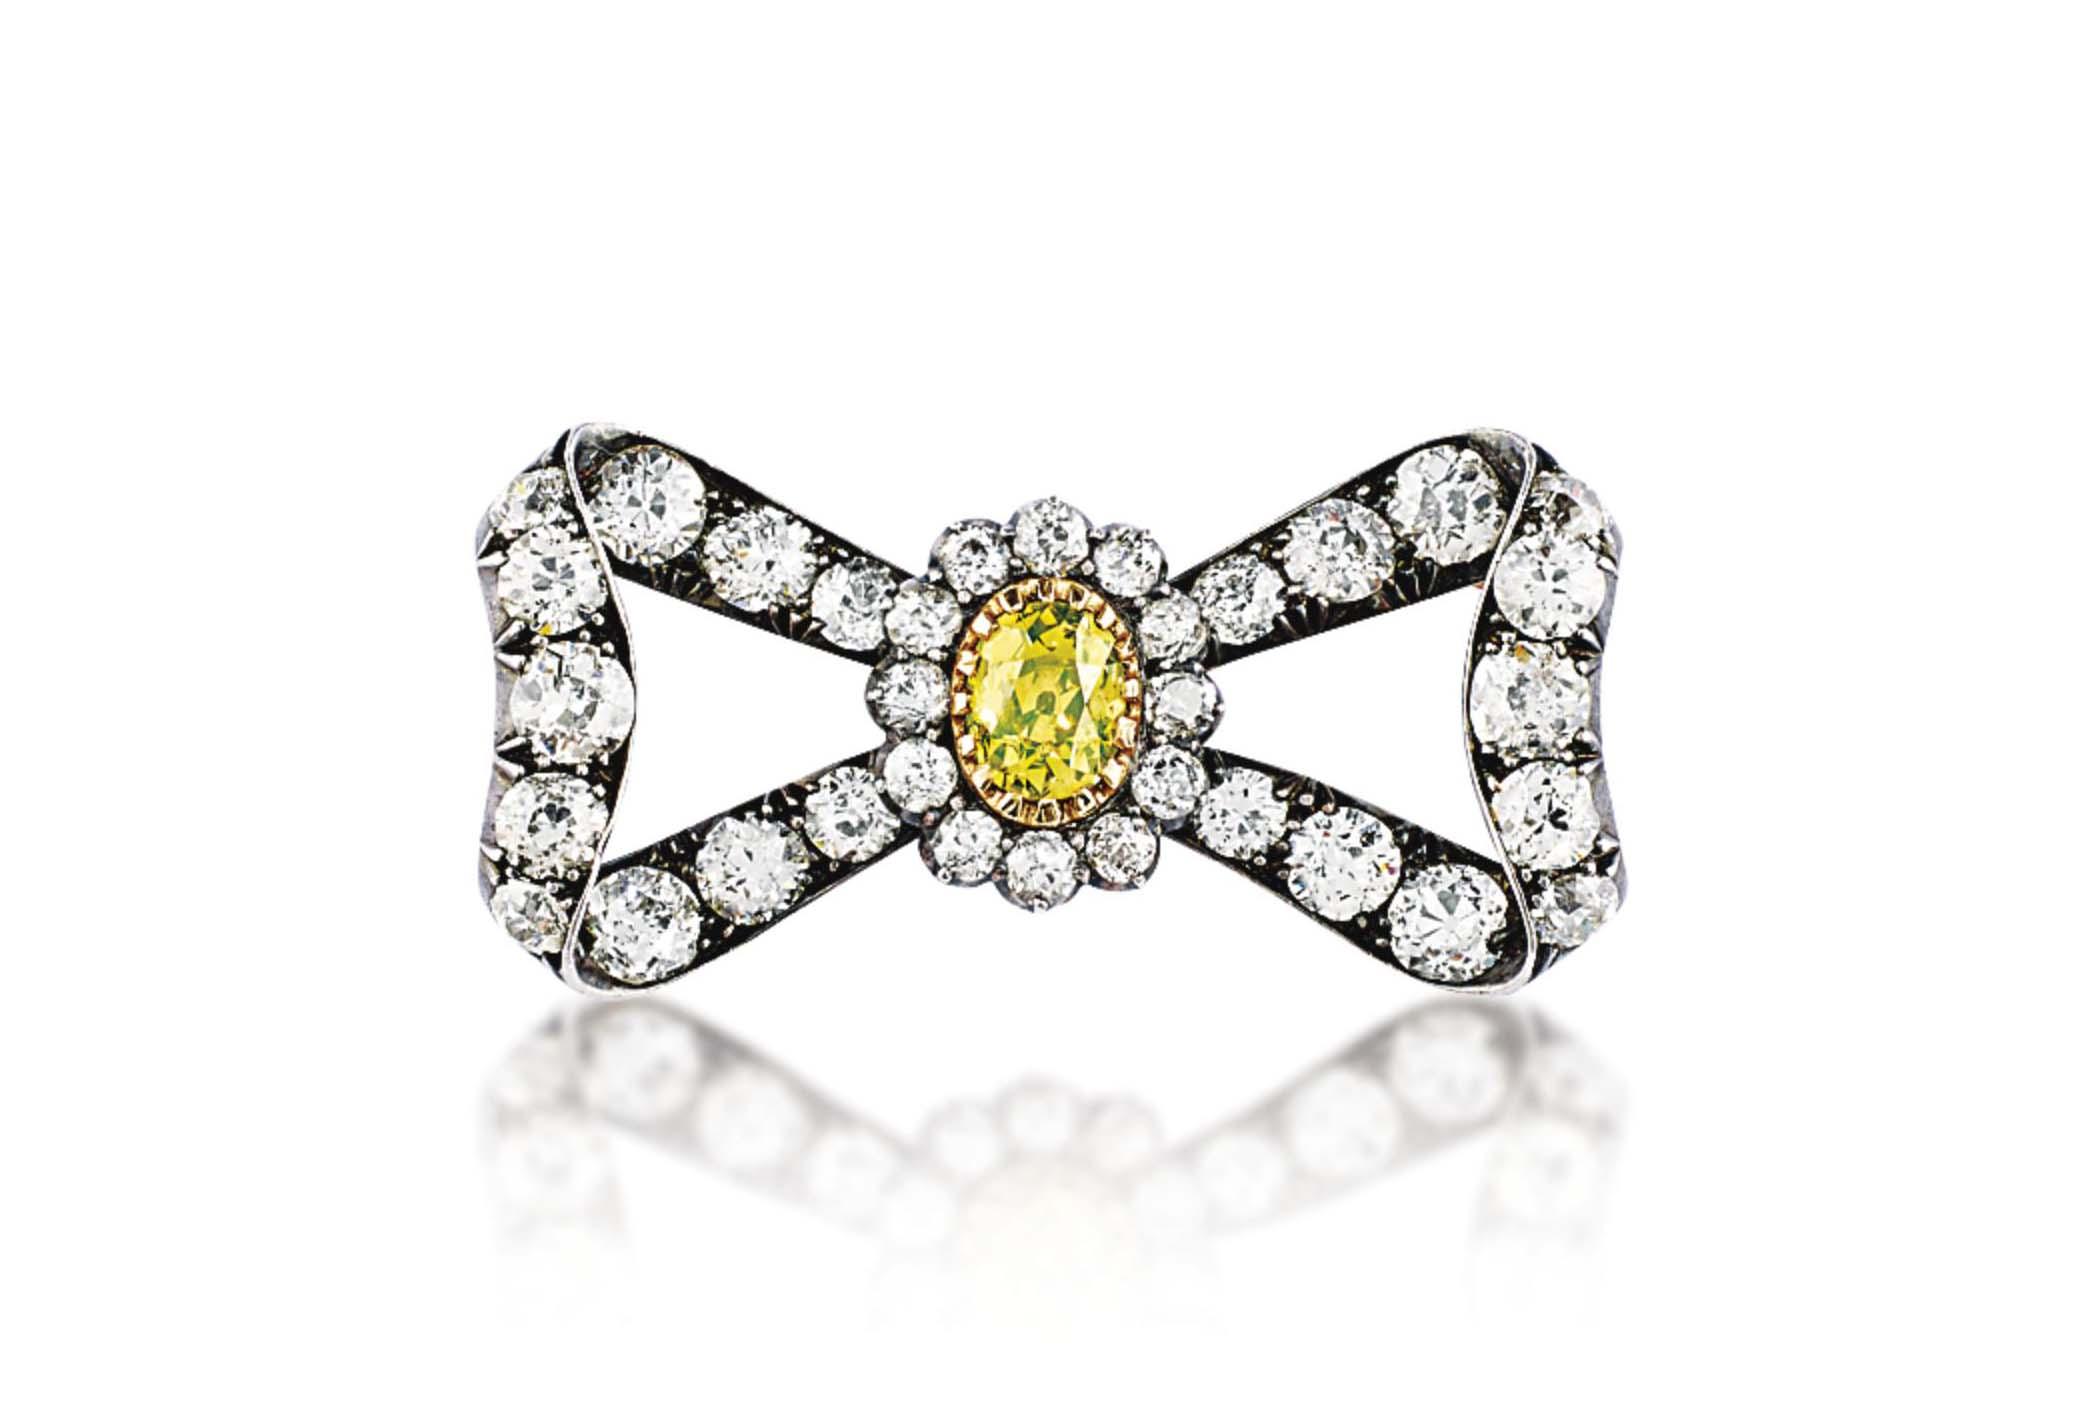 A 19TH CENTURY COLOURED DIAMON